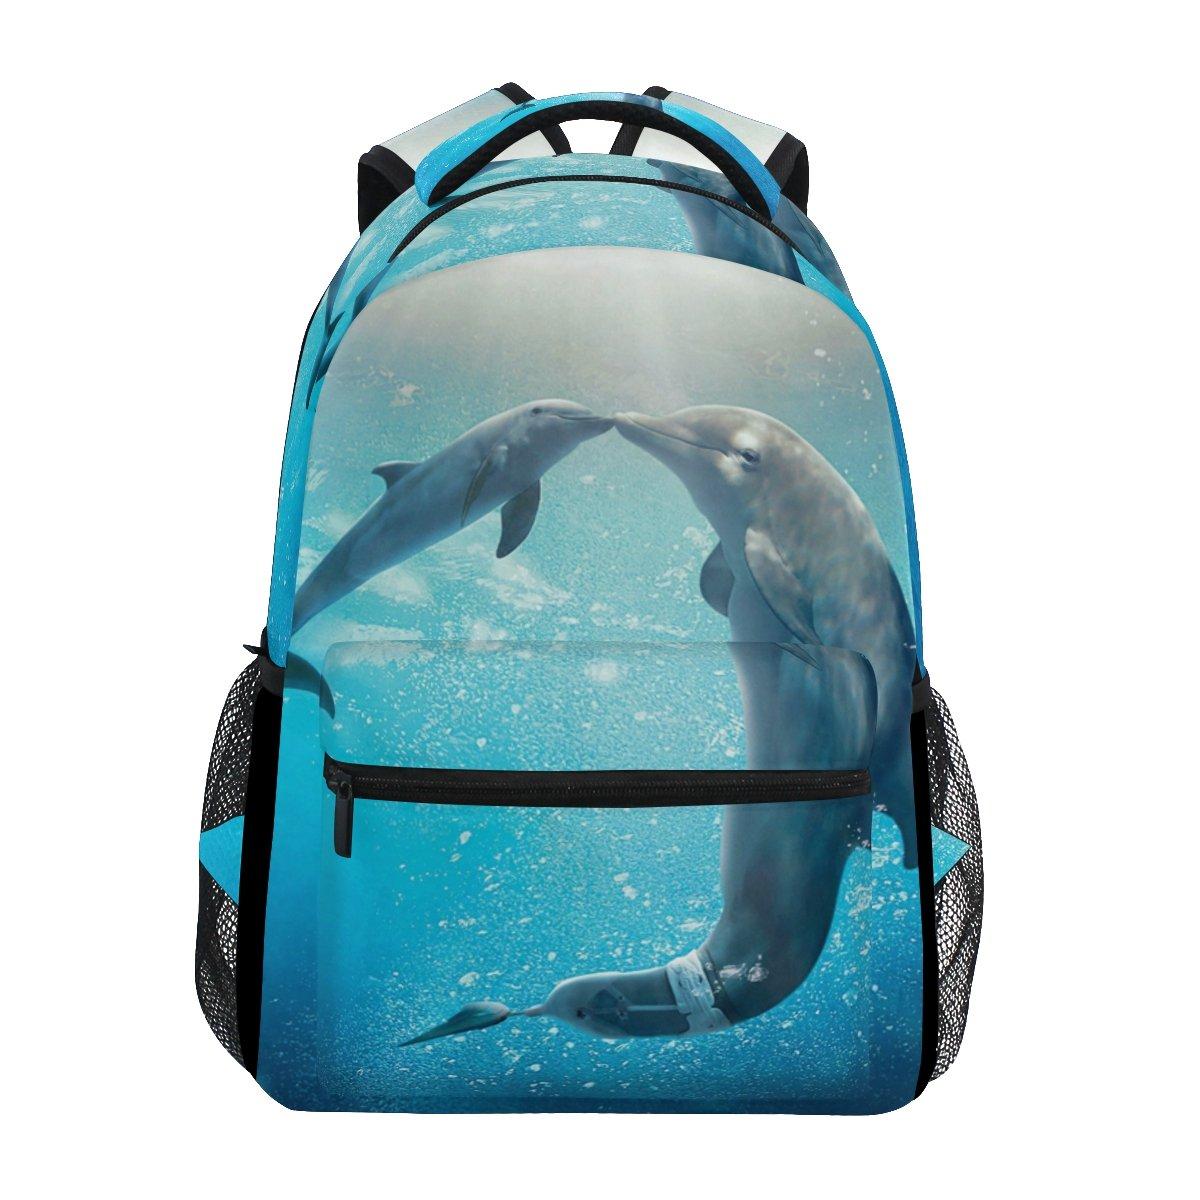 a82c7868a GIOVANIOR Kiss Dolphin Tale Backpack School Bag Bookbag Hiking Travel  Rucksack